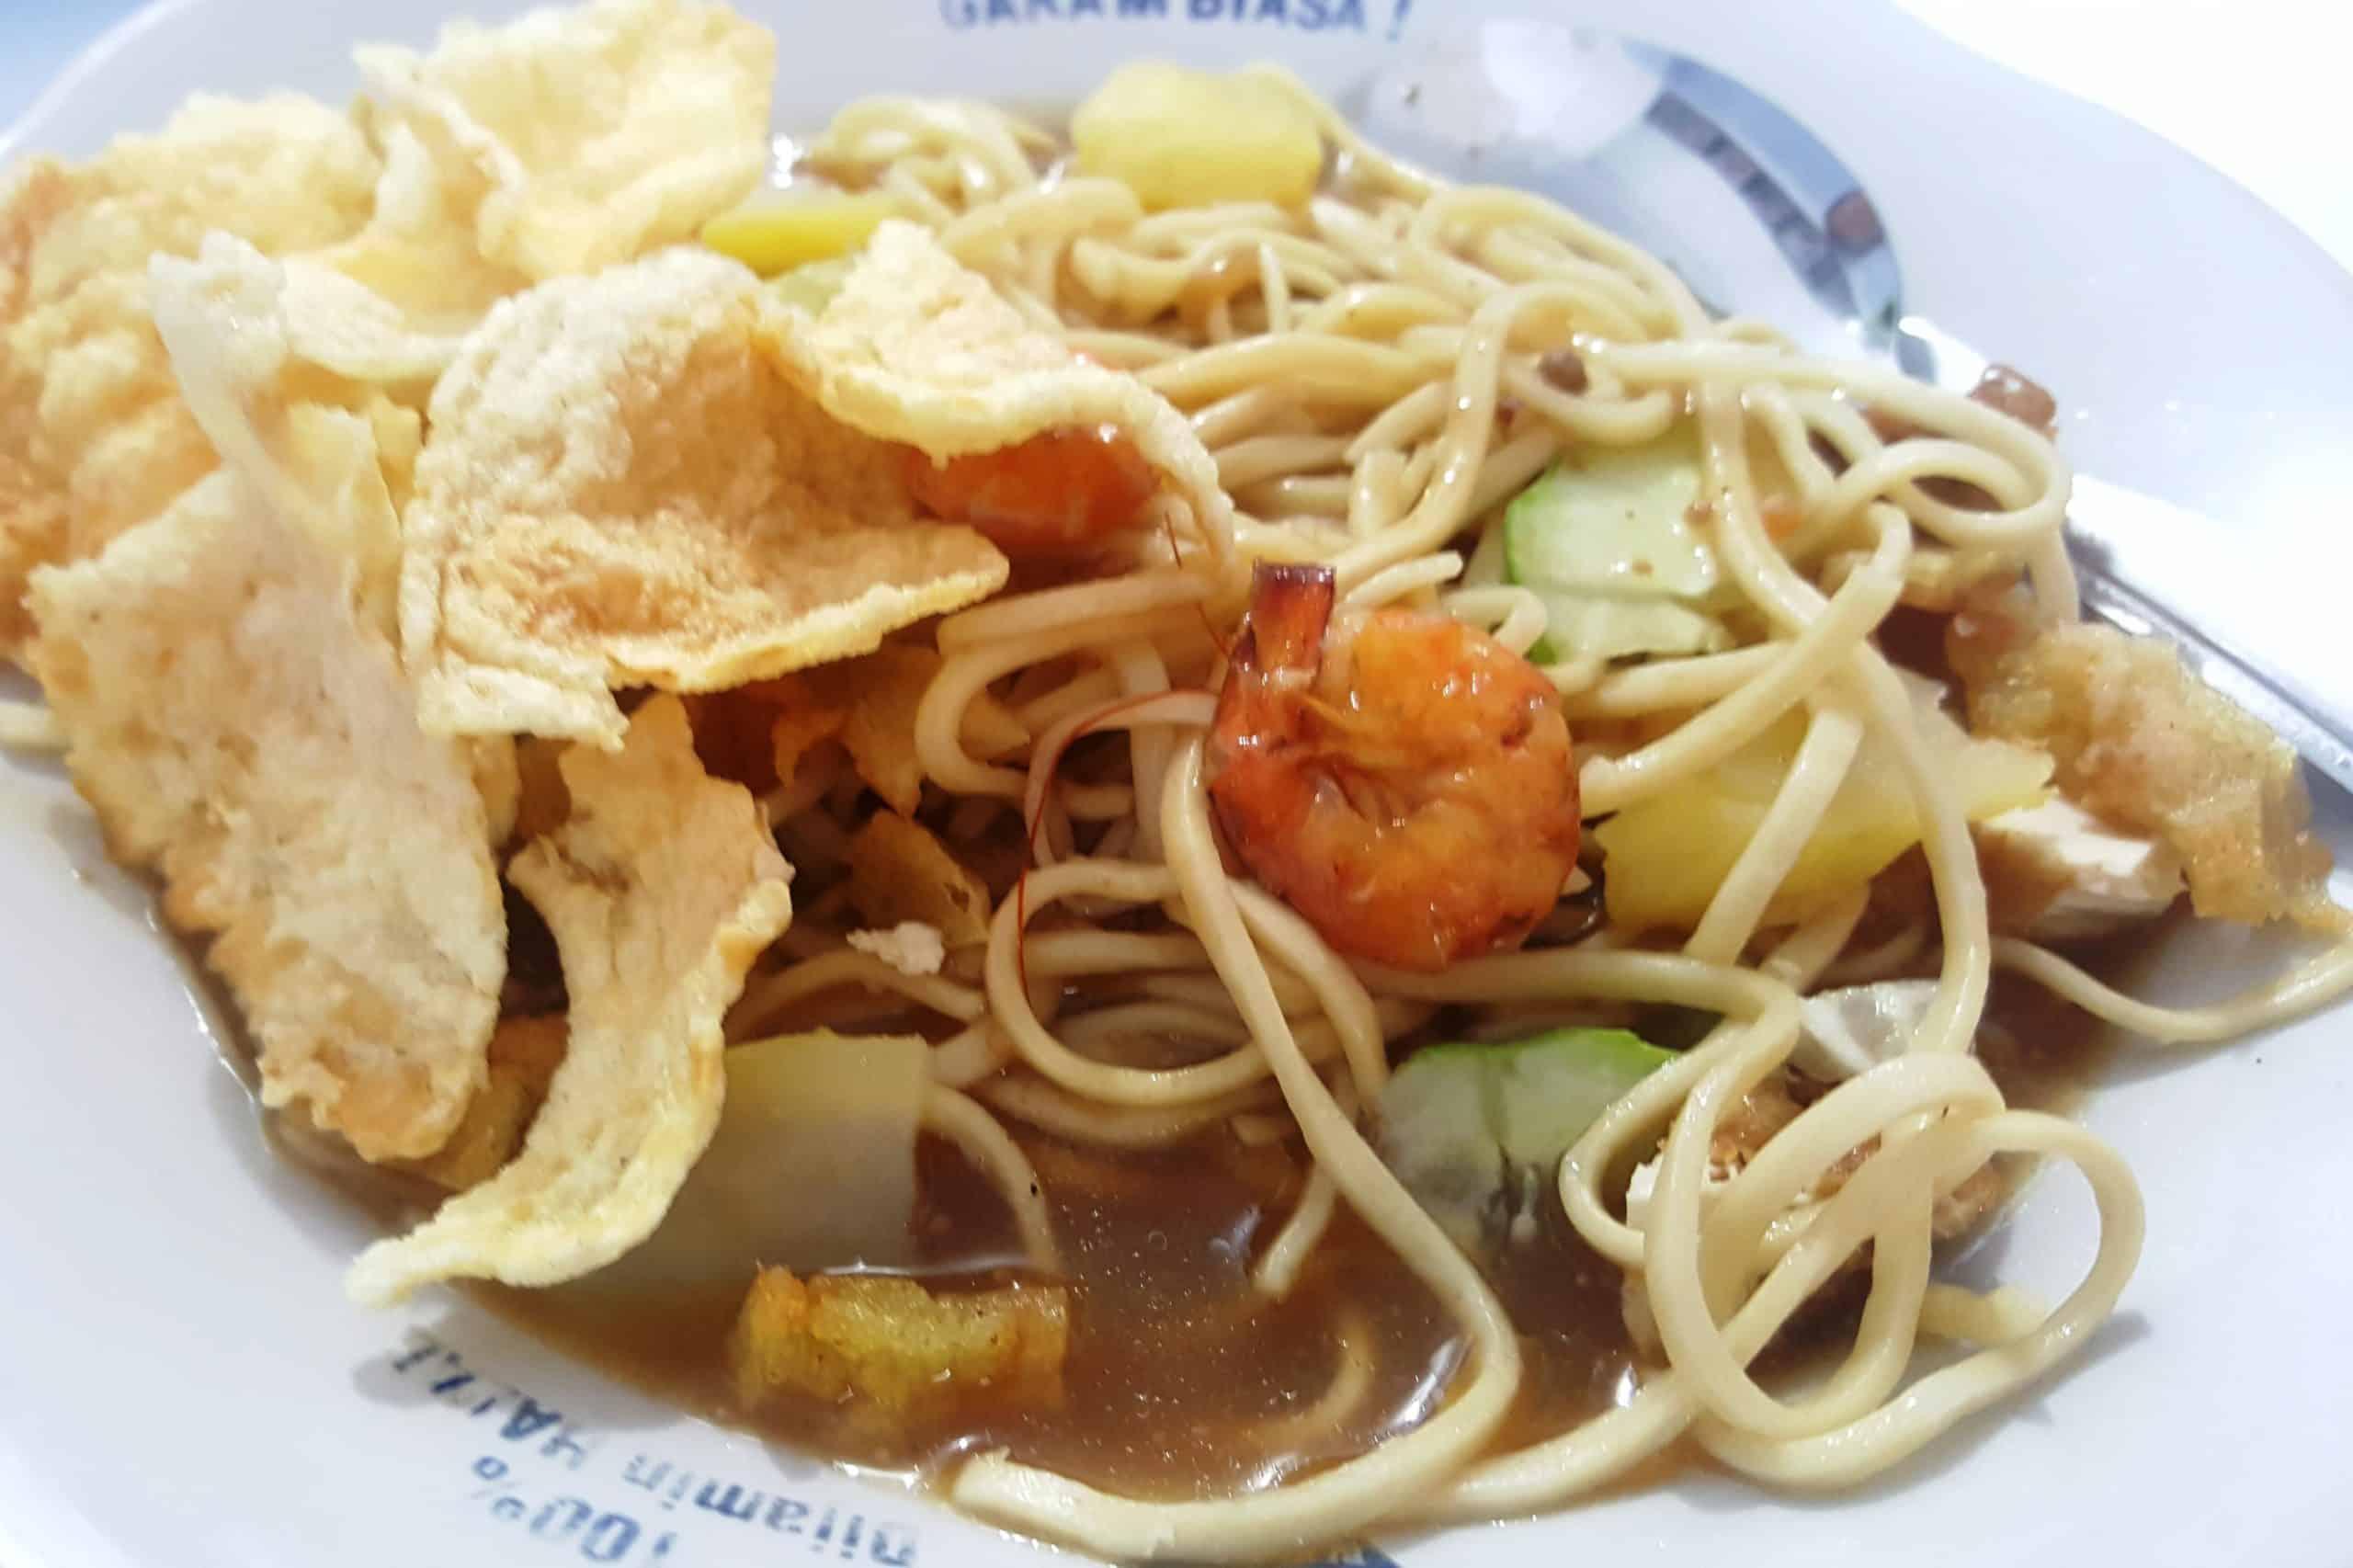 gambar makanan khas bangka belitung Mie Belitung